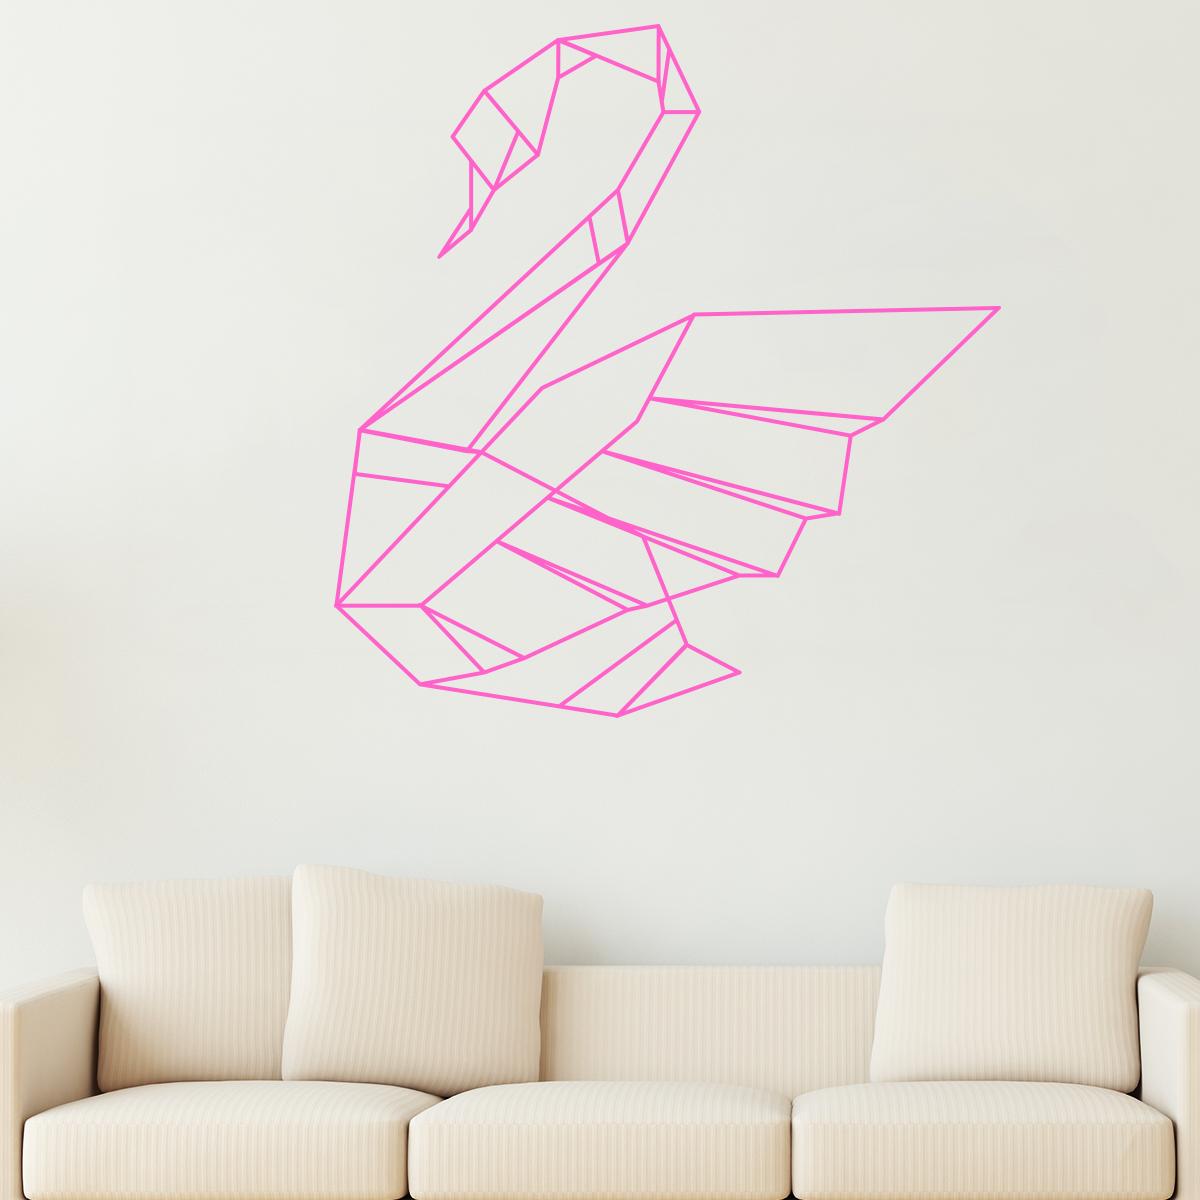 sticker origami cygne stickers animaux oiseaux ambiance sticker. Black Bedroom Furniture Sets. Home Design Ideas